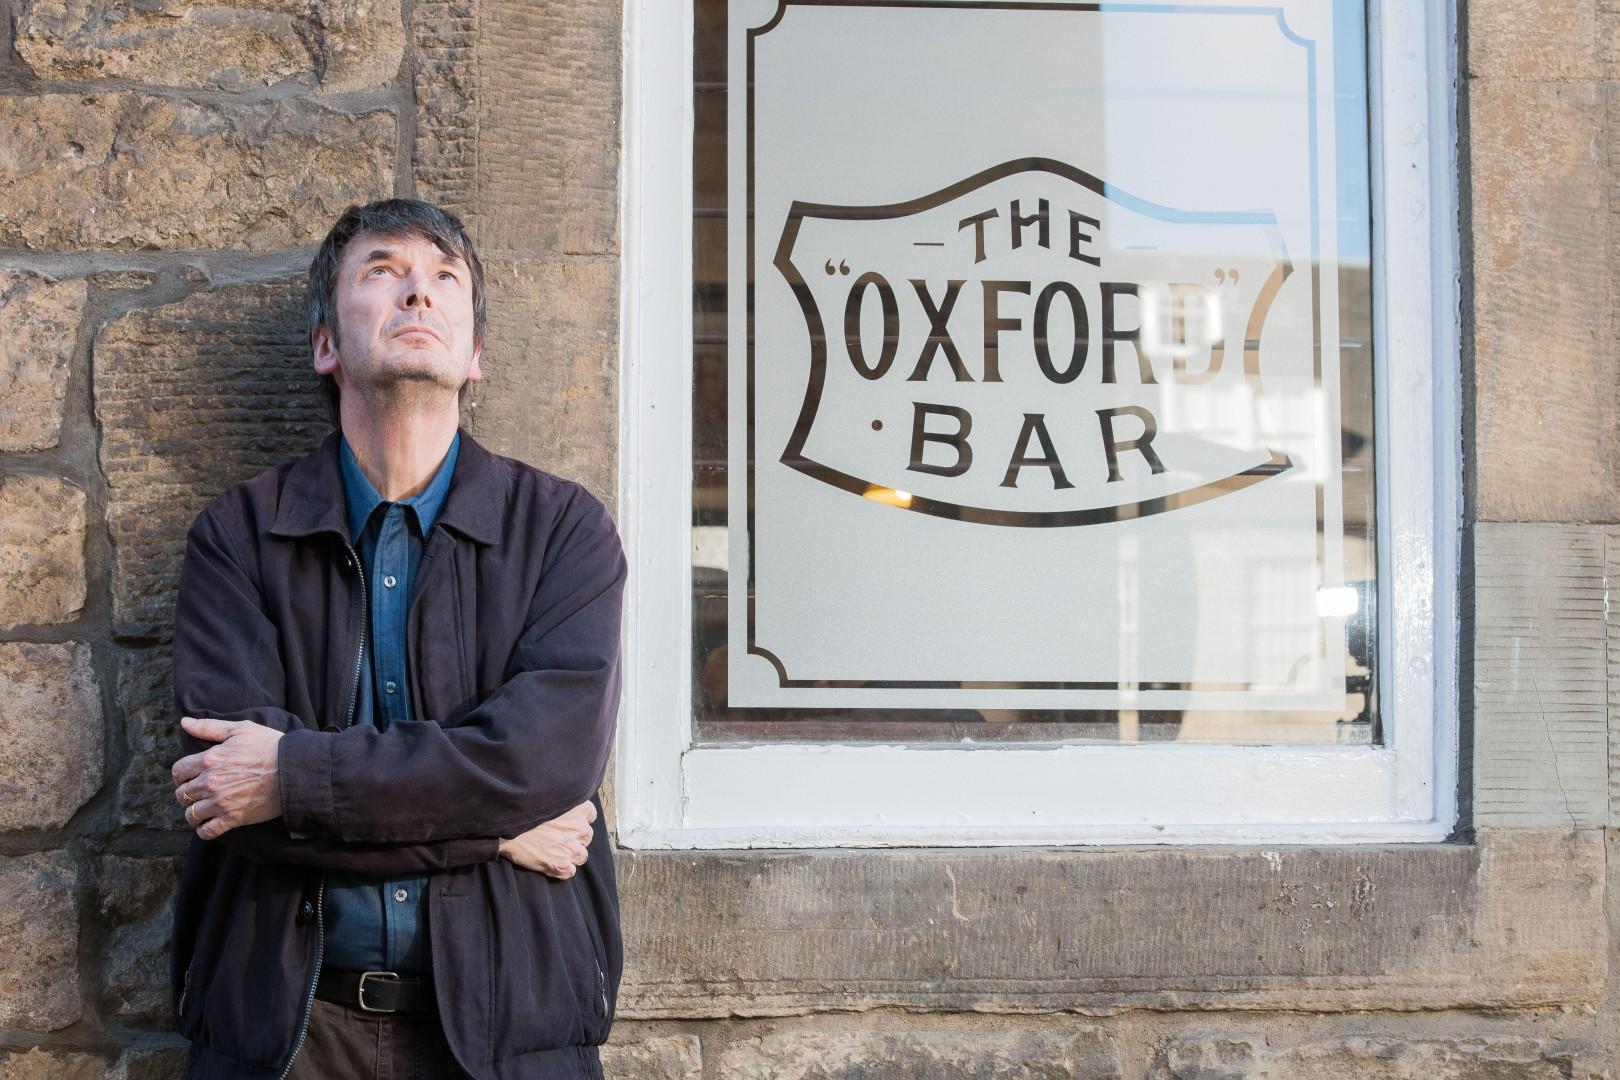 Author Ian Rankin on 30 years with John Rebus, irascible detective